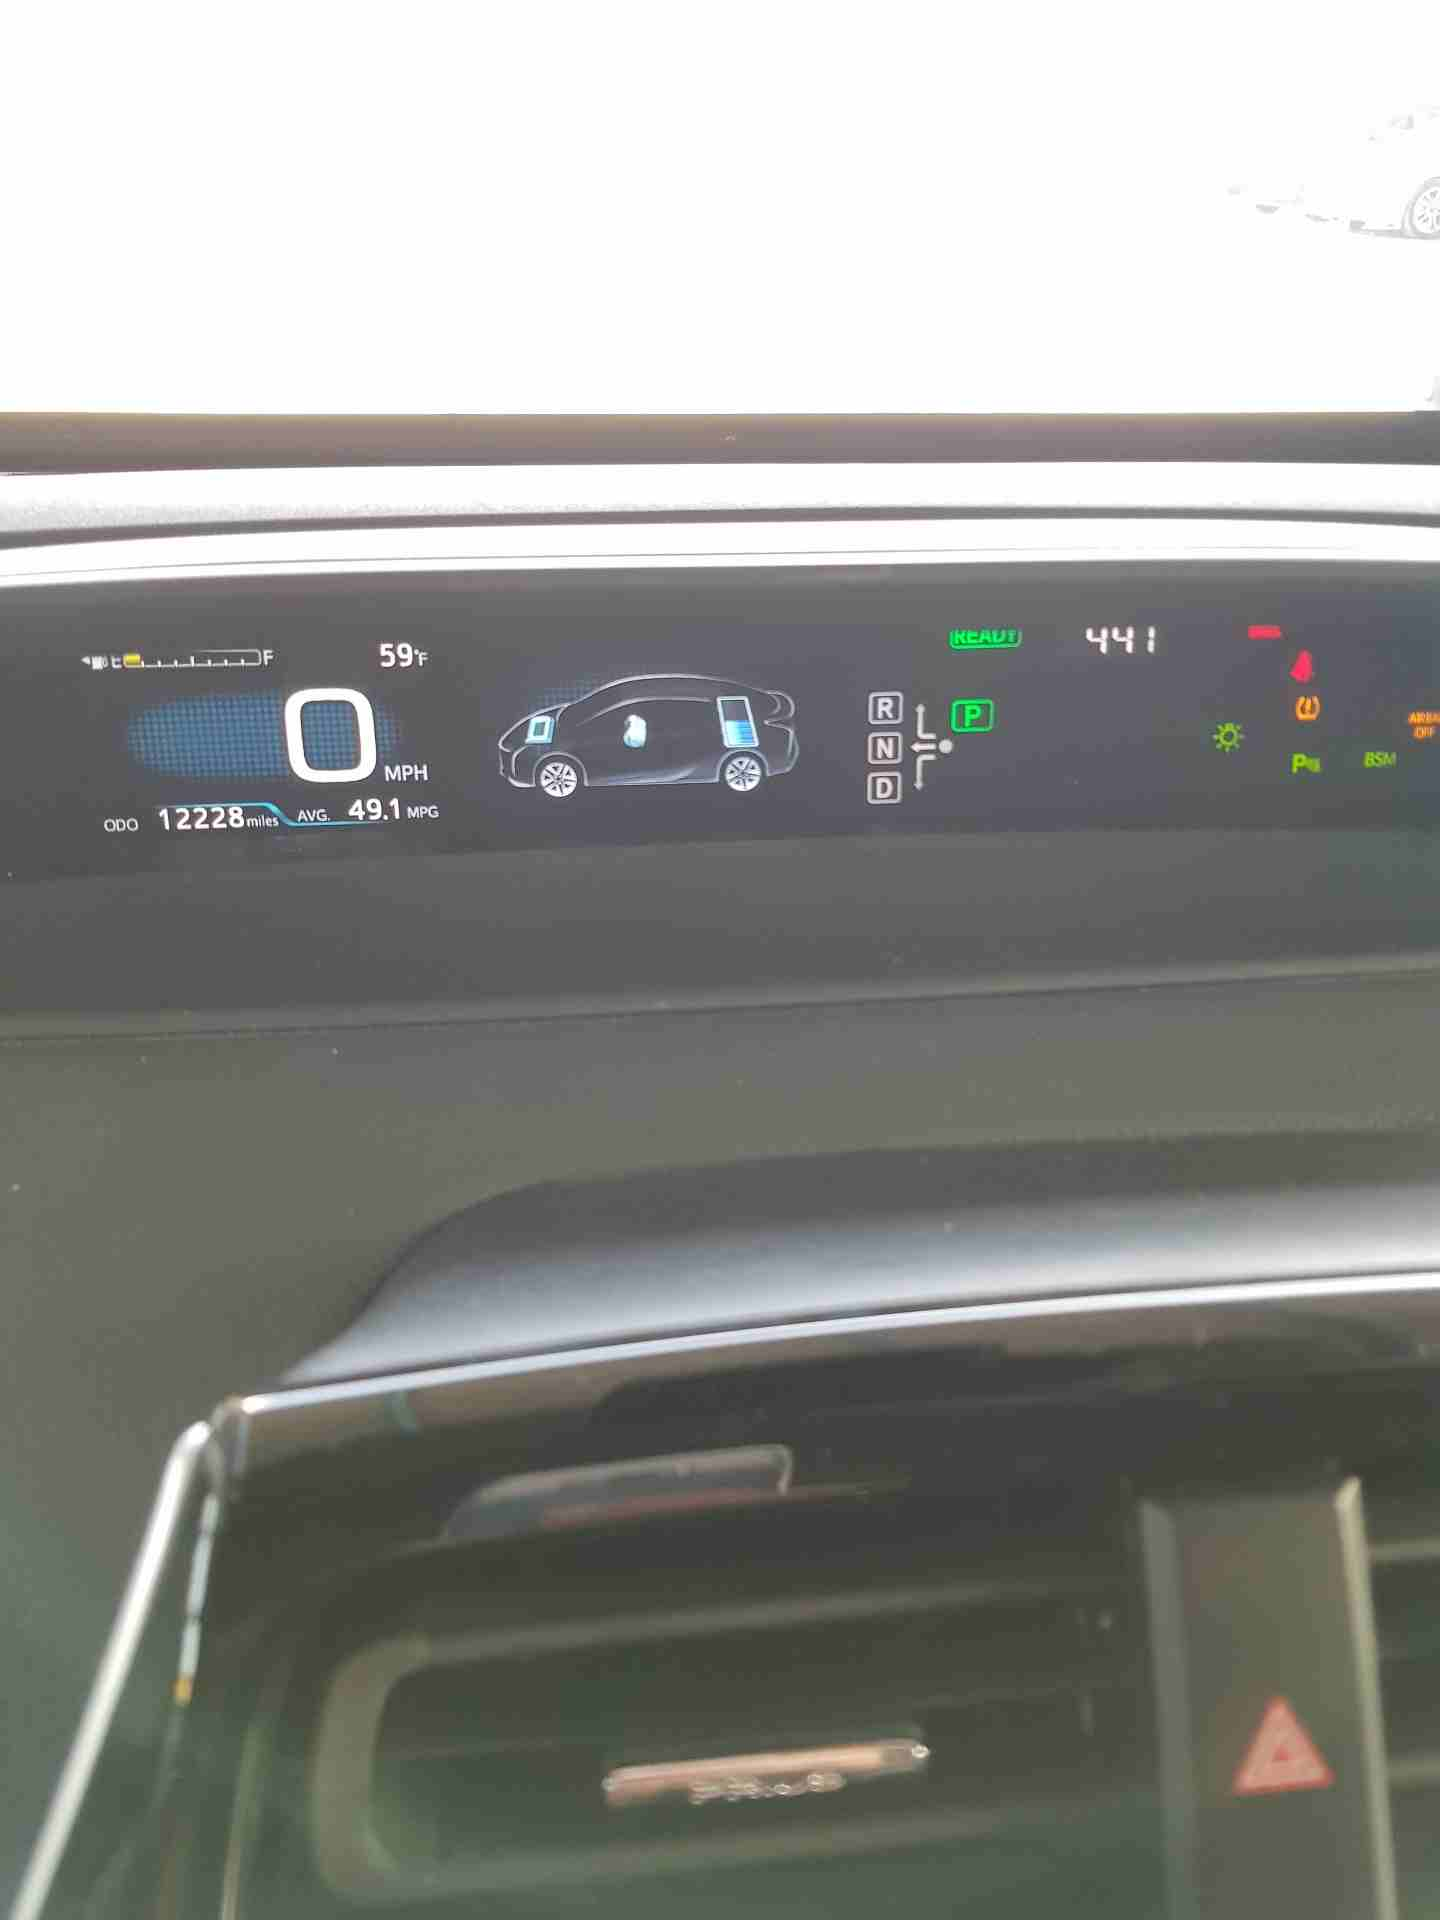 مستعملة فولكس فاجن تيغوان 2.0T Wagon 2009-  تويوتا بريوس 2017 لا تنسَ...